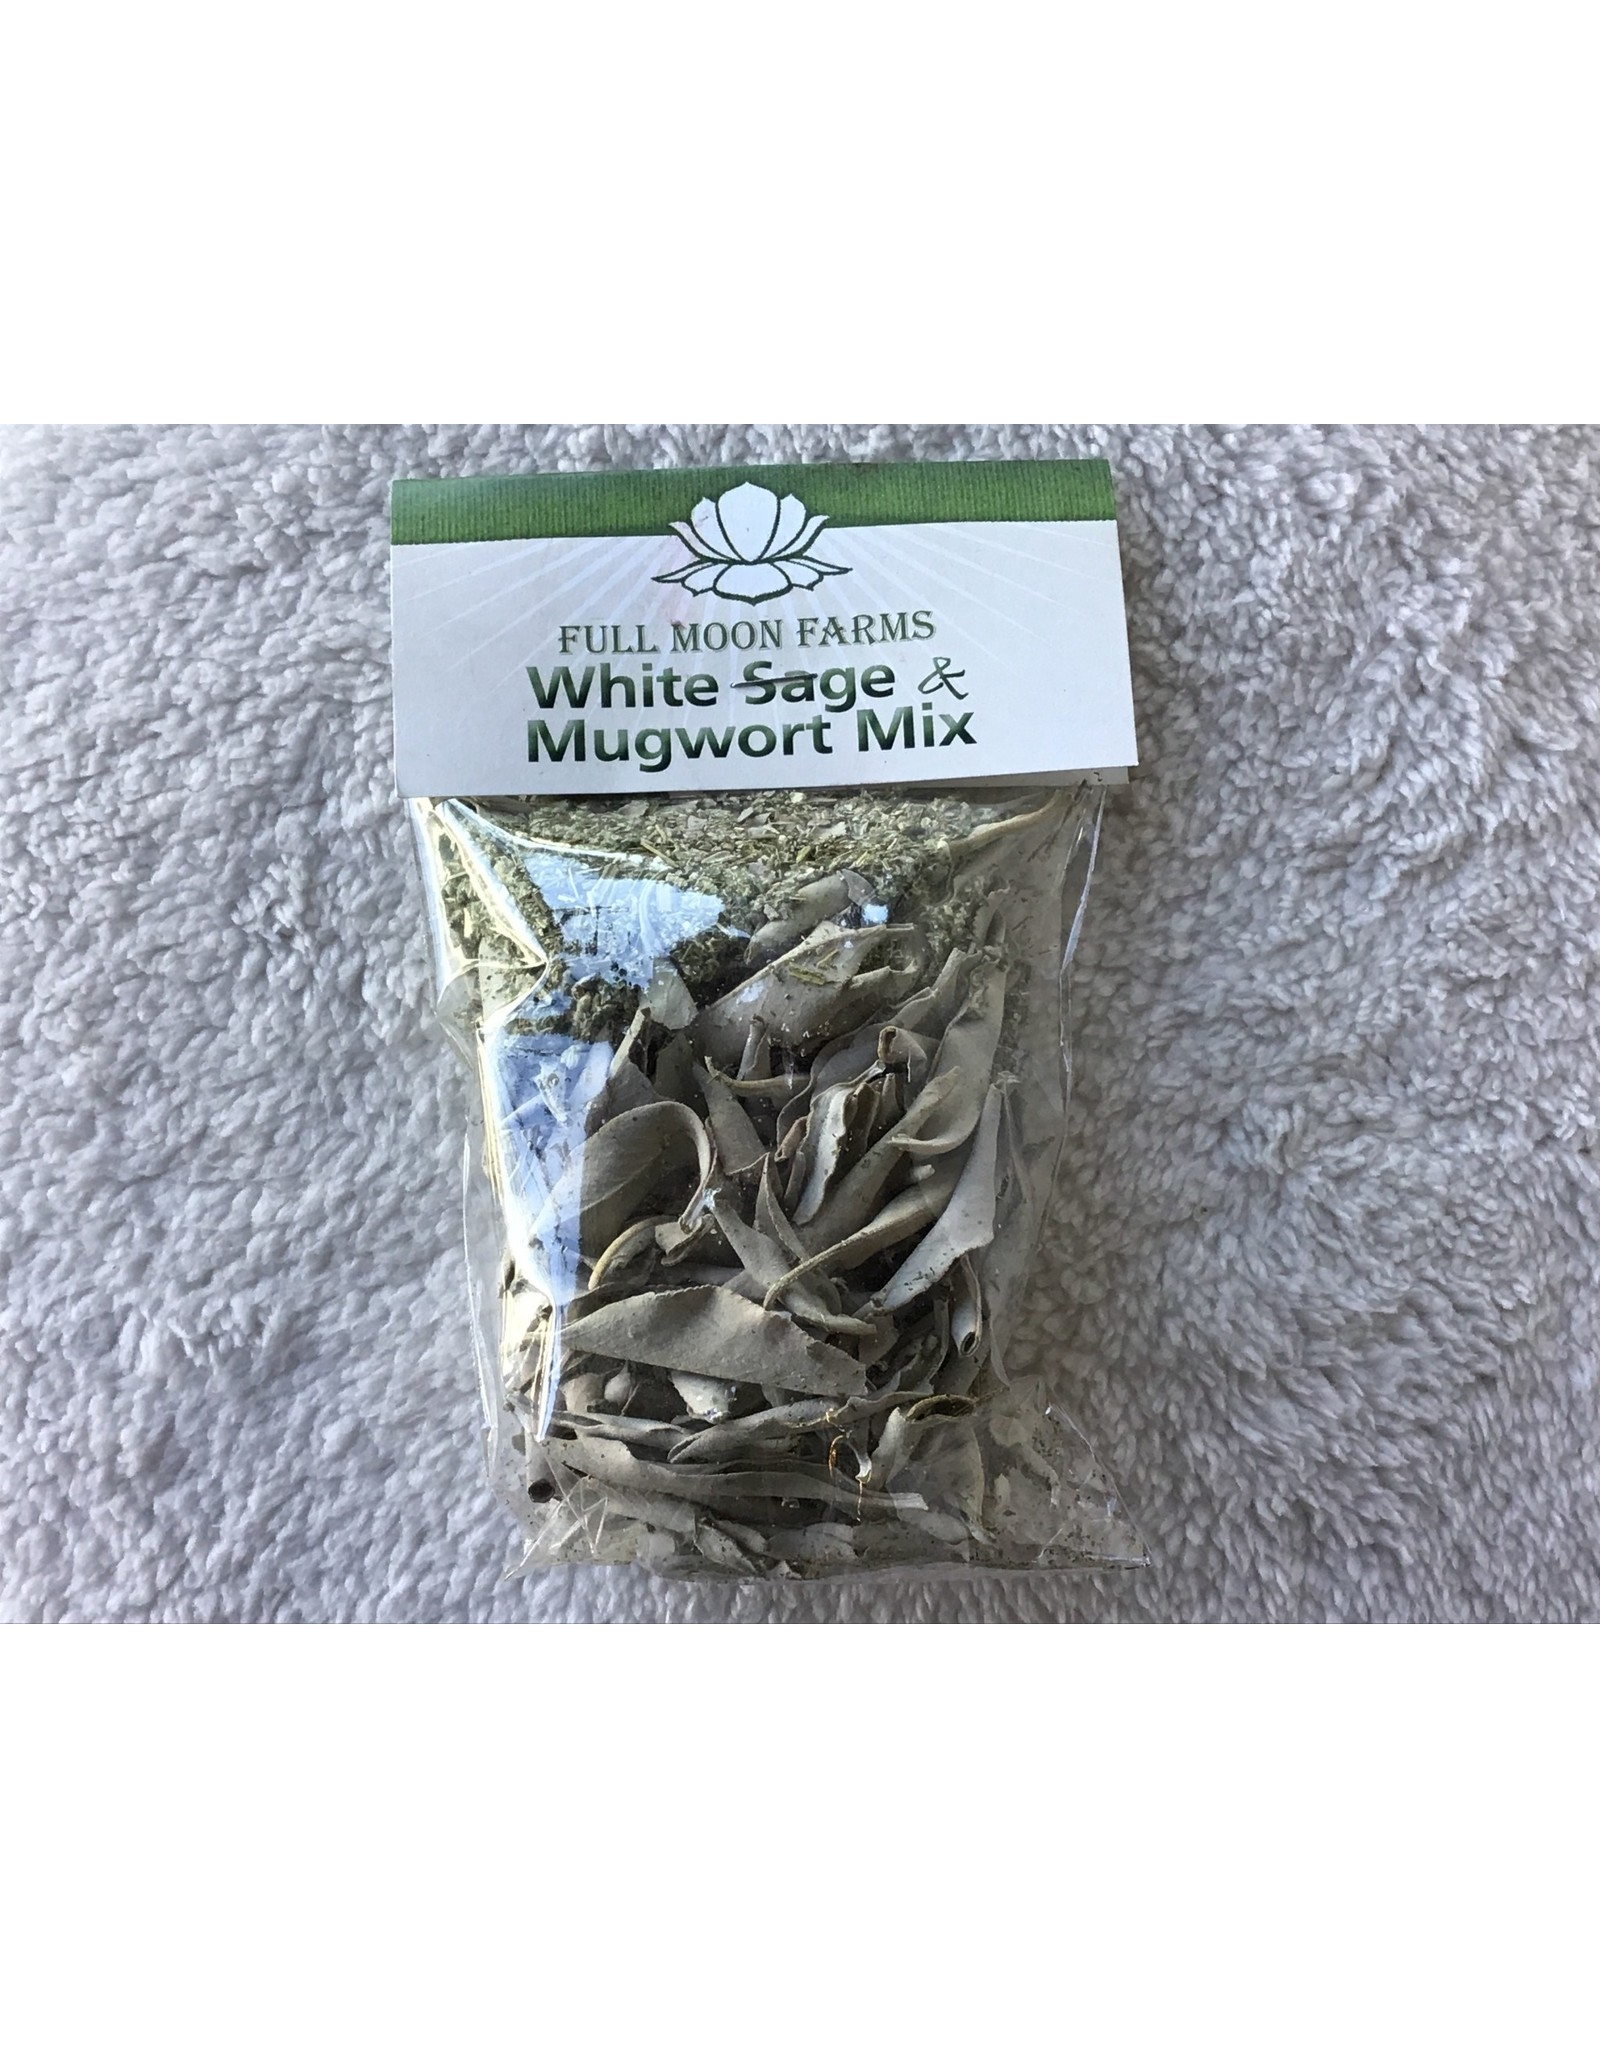 Full Moons Farms White Sage & Mugwort Mix